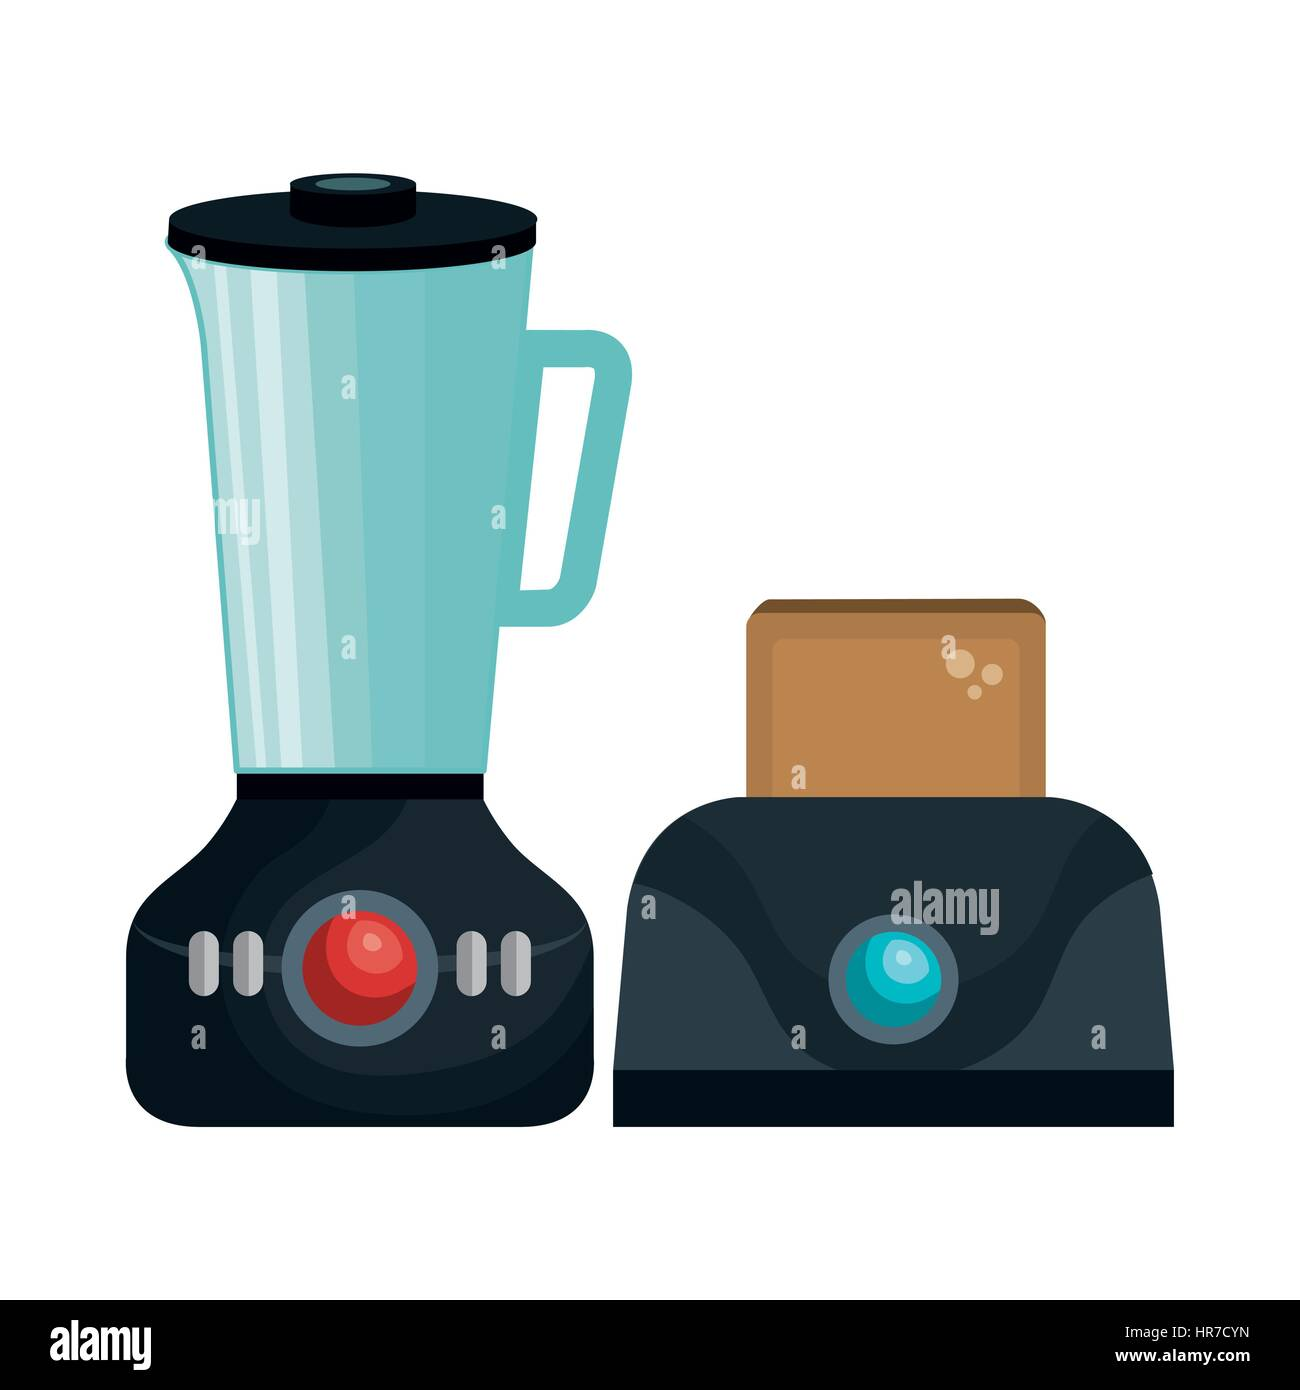 home appliances tech icon - Stock Image